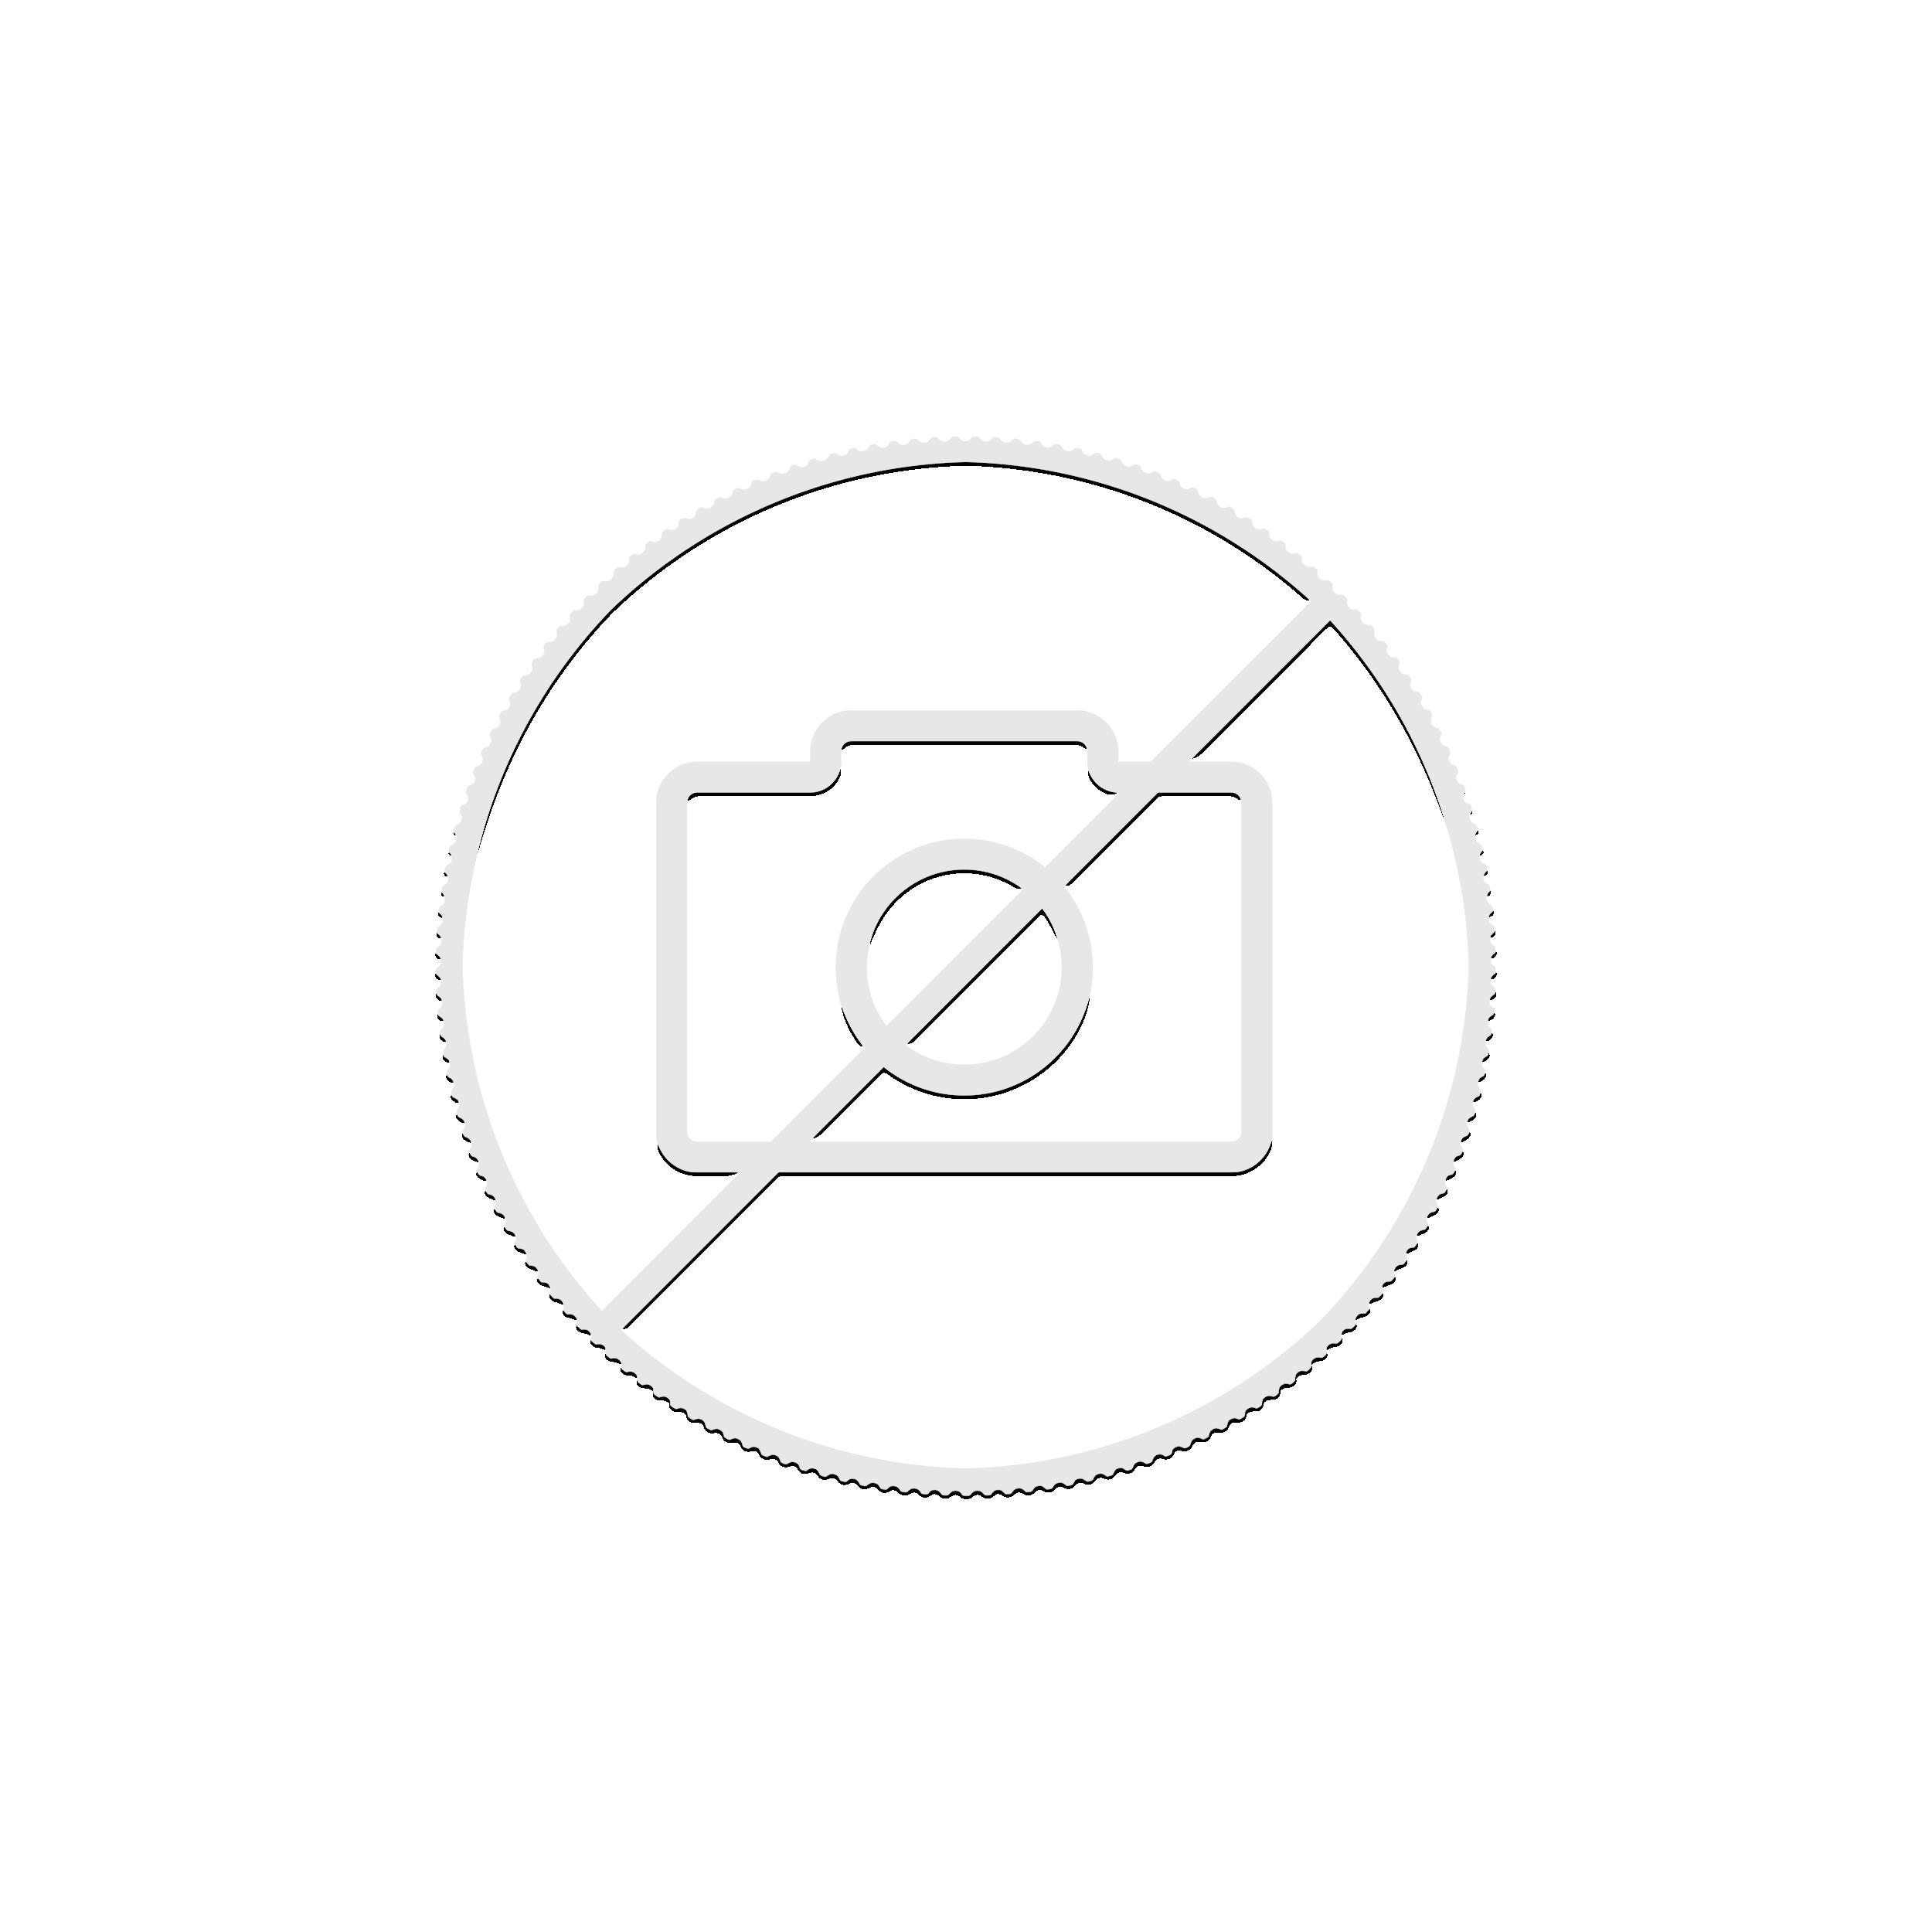 1 troy ounce platinum coin Britannia 2021